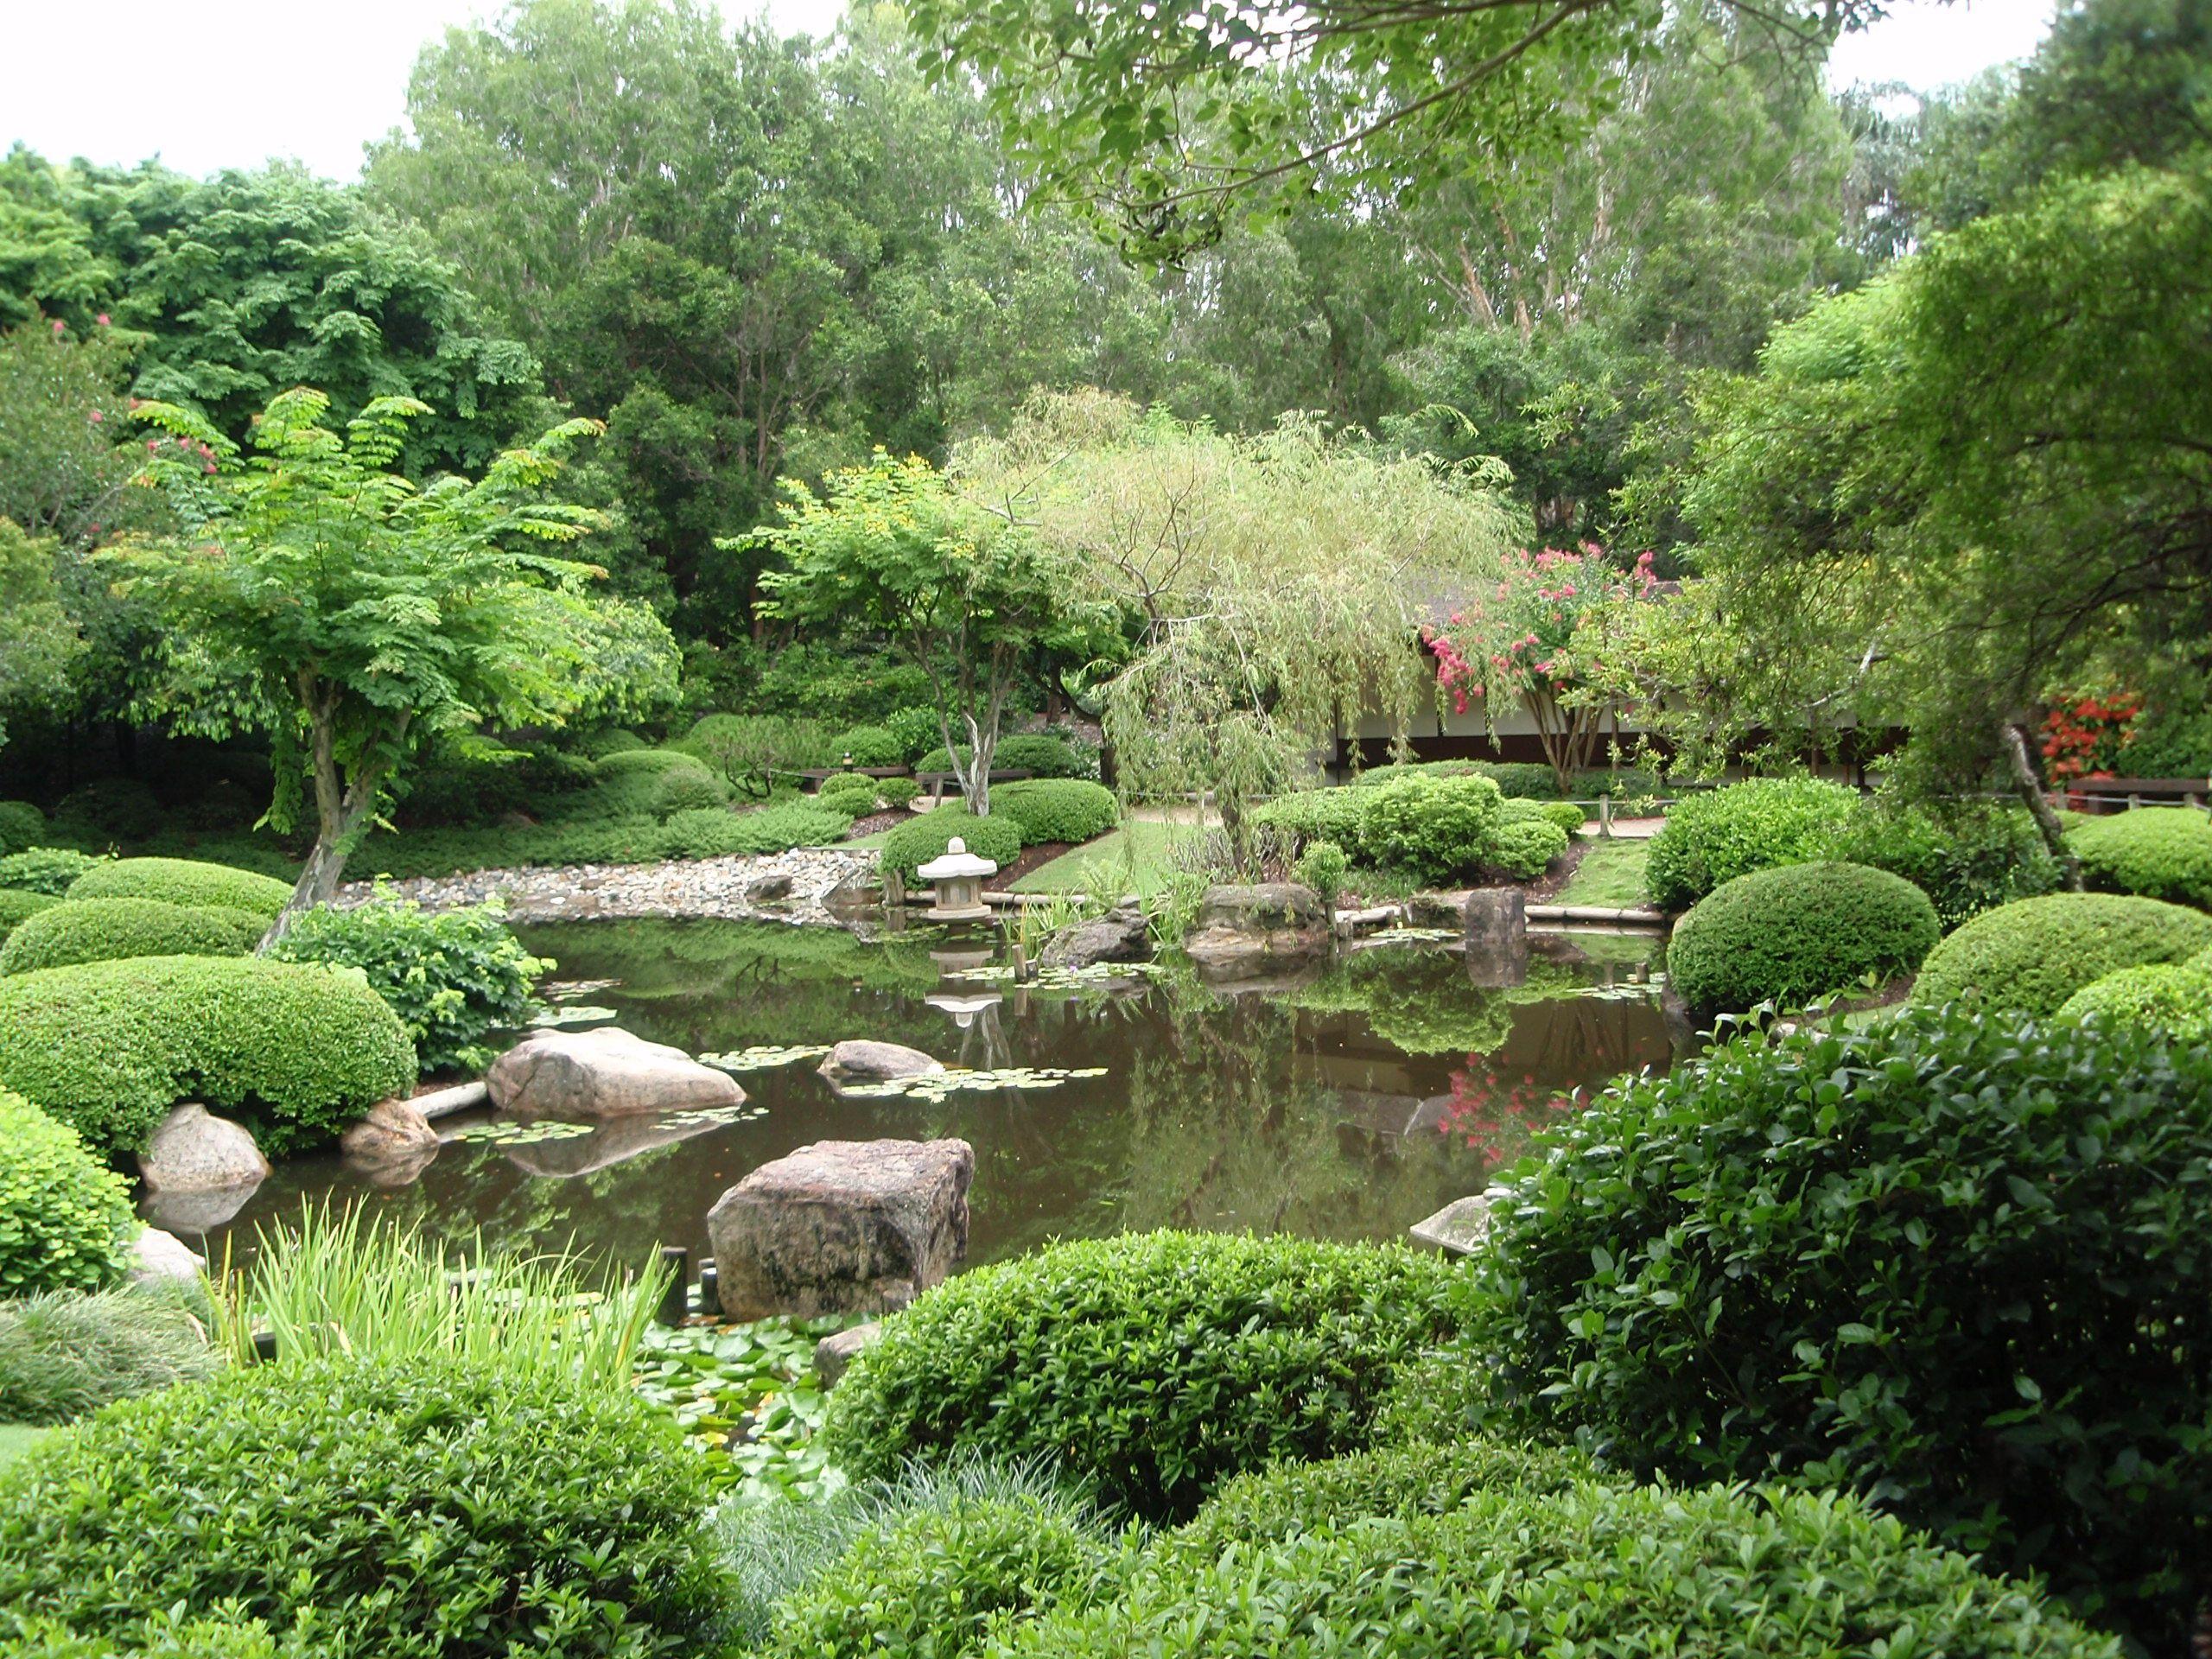 mt cootha botanical gardens 2 brisbane australia favorite places